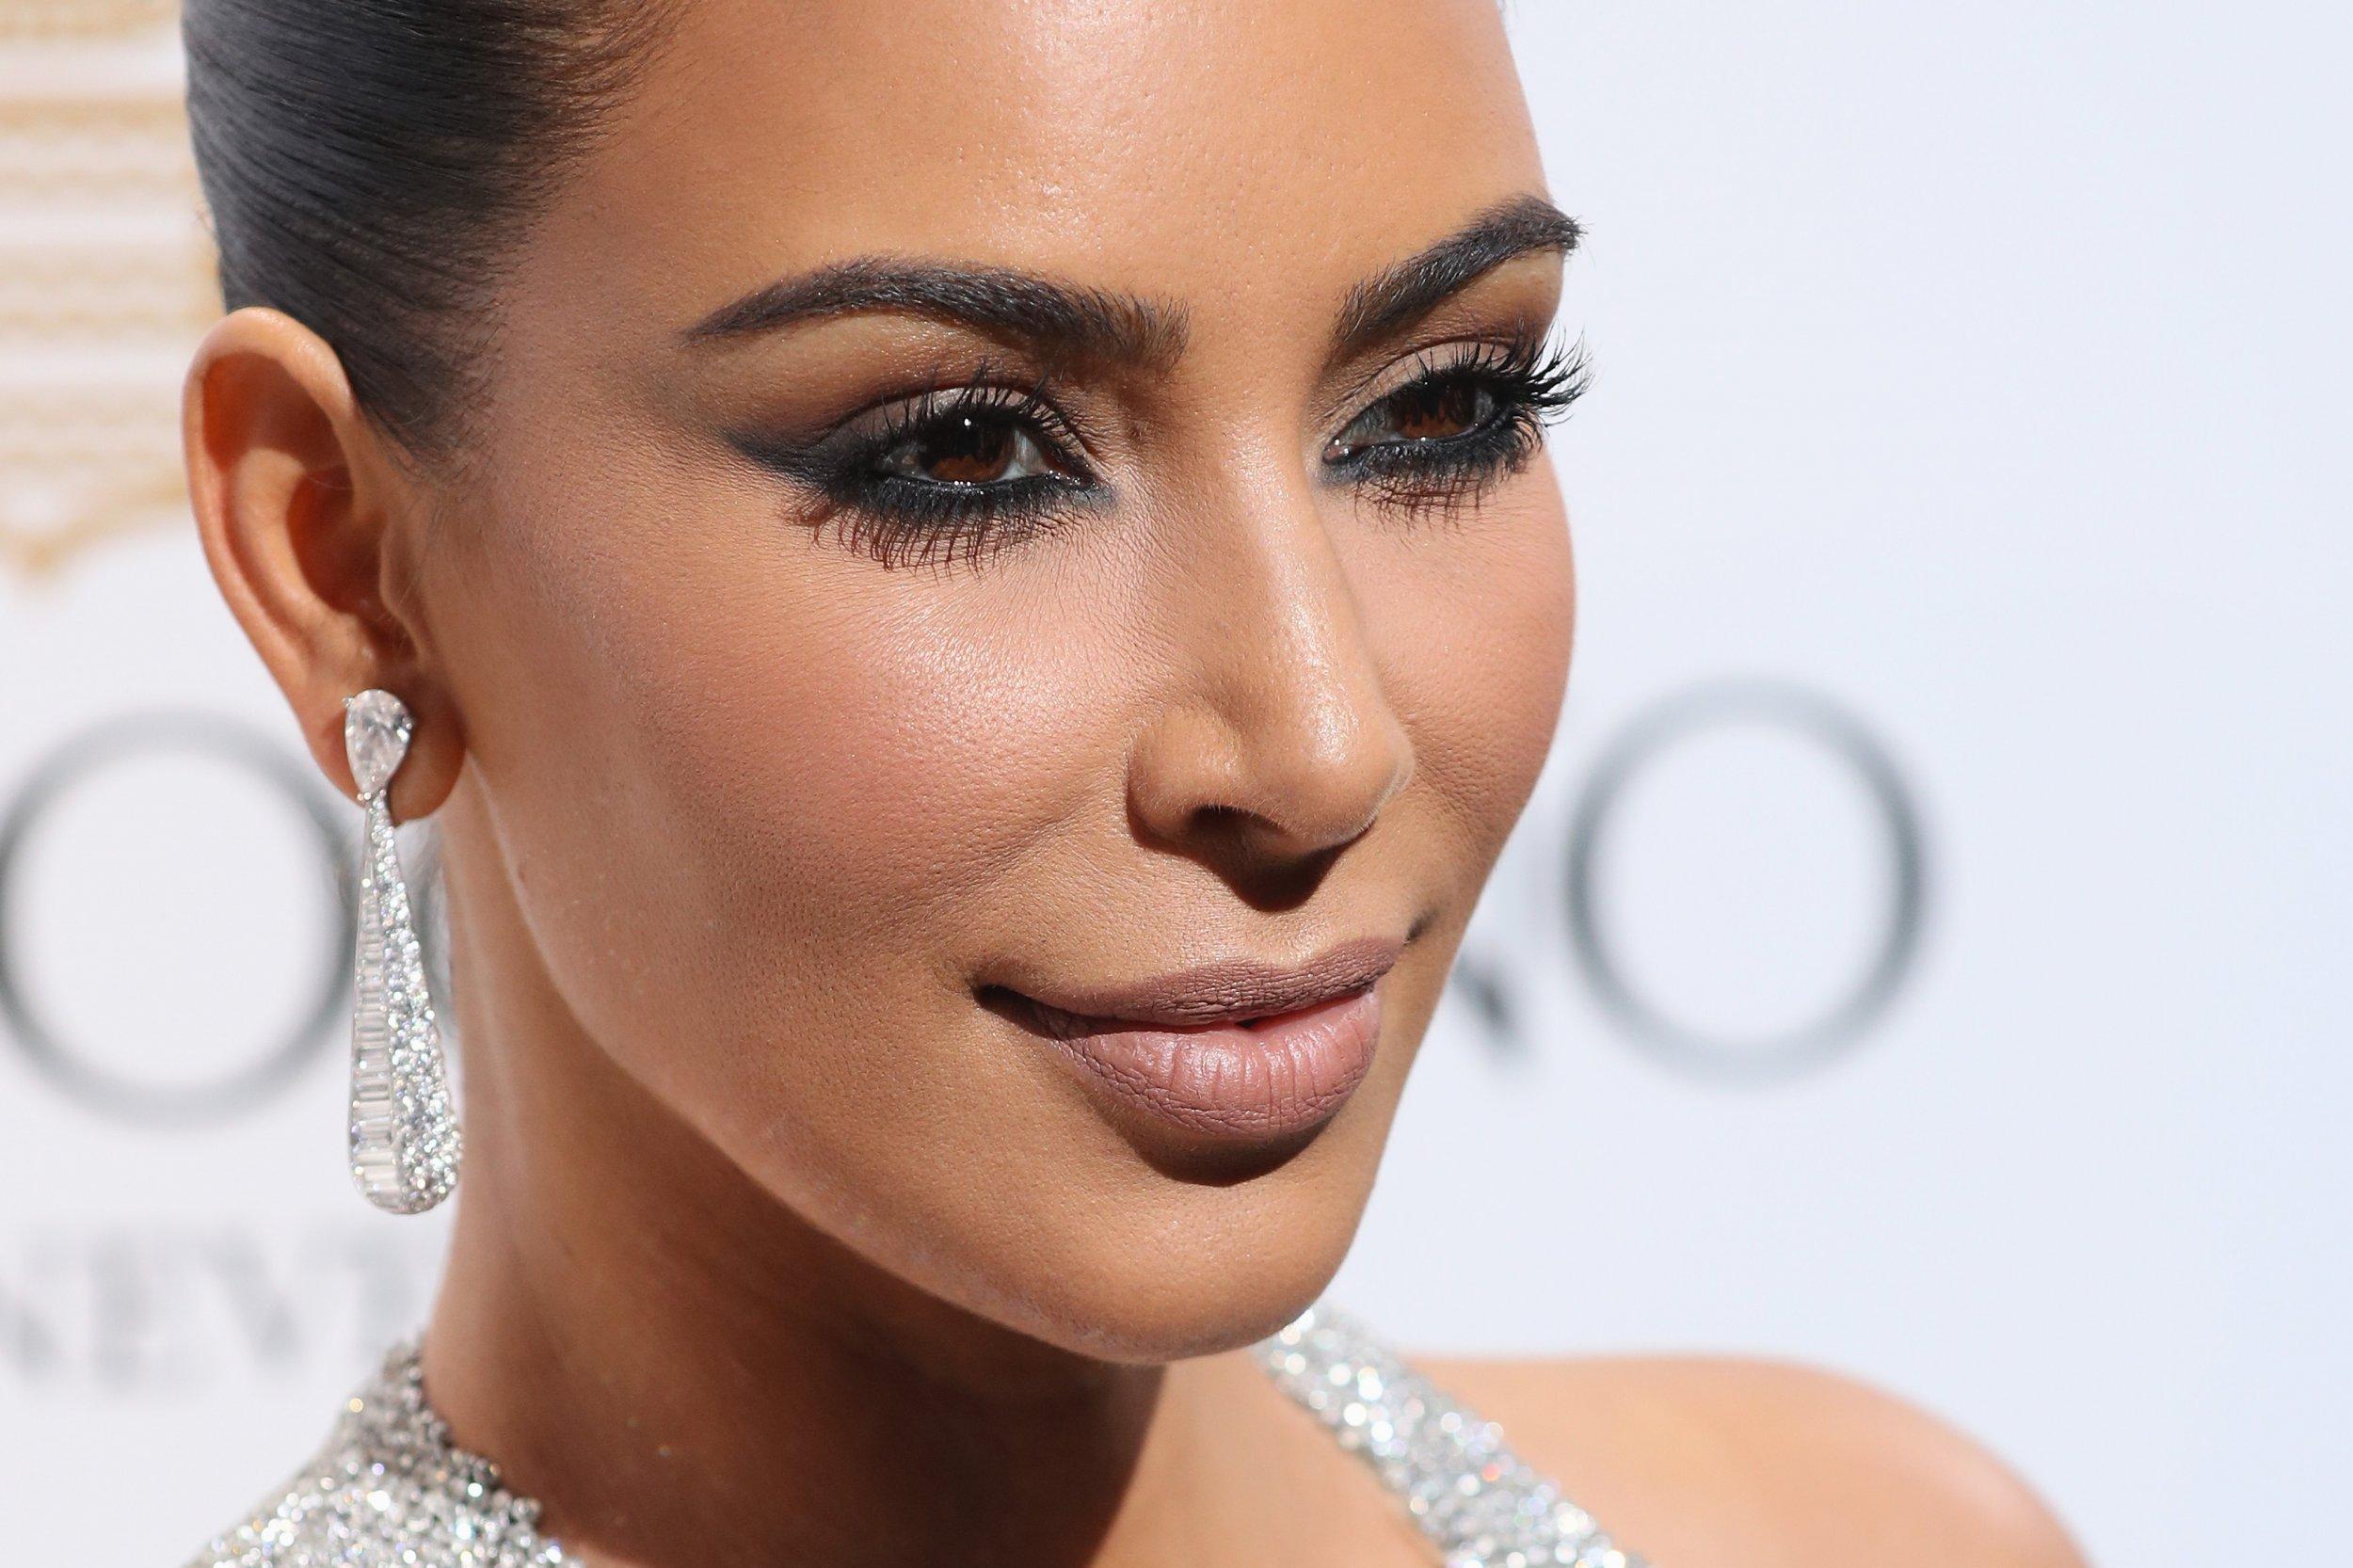 Theme Kim kardashian self nude sorry, that